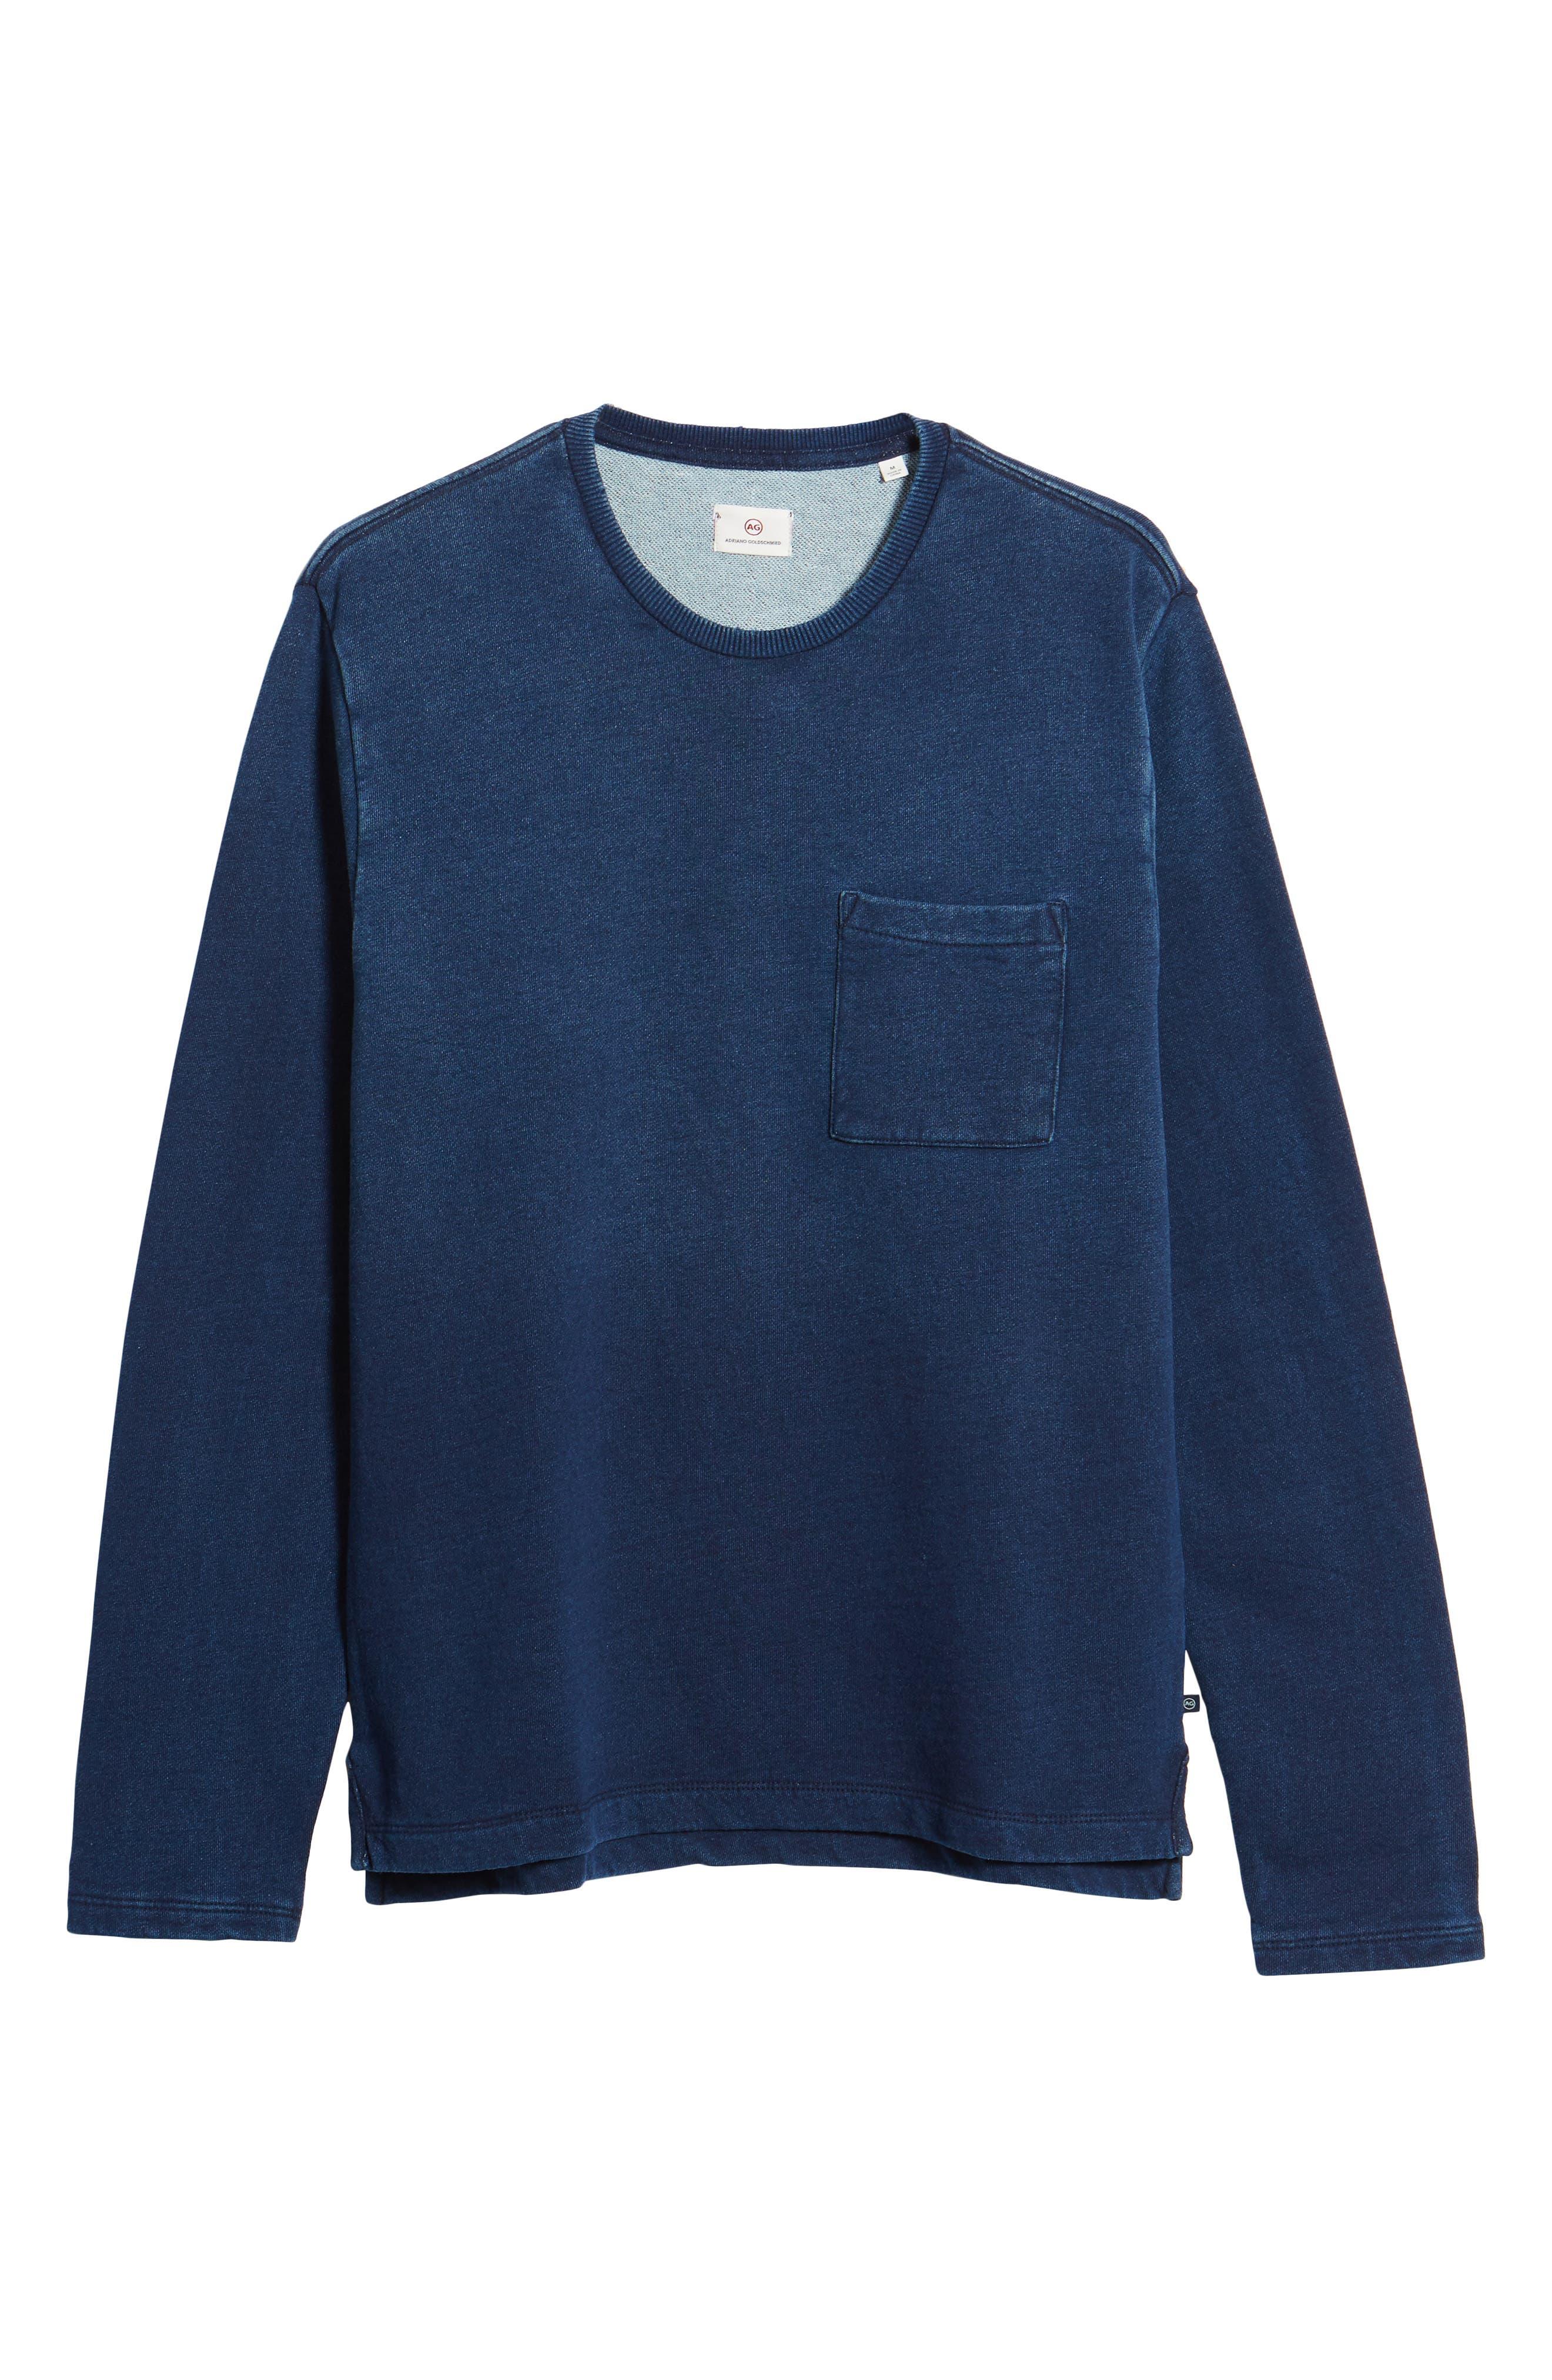 Byron Crewneck Cotton Pocket Sweatshirt,                             Alternate thumbnail 6, color,                             Harbor